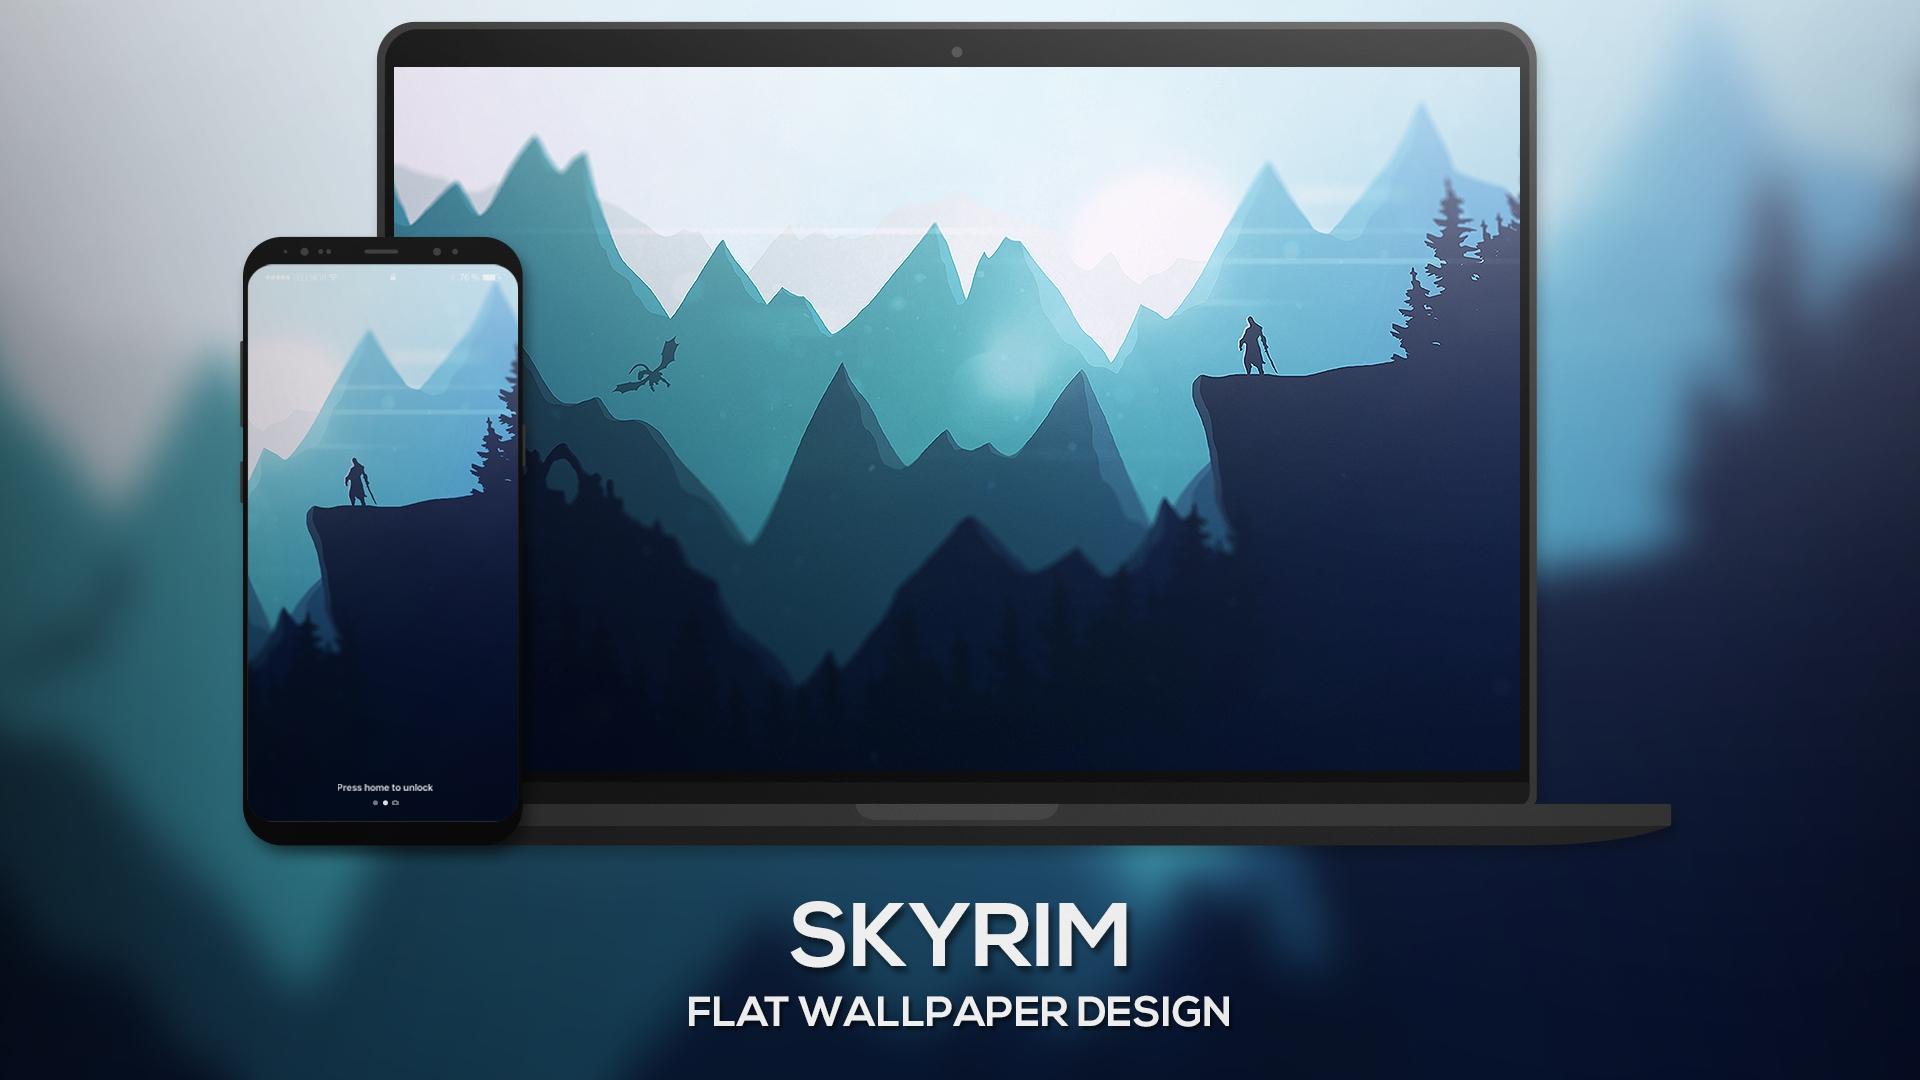 skyrim wallpaper,screen,gadget,technology,sky,electronic device